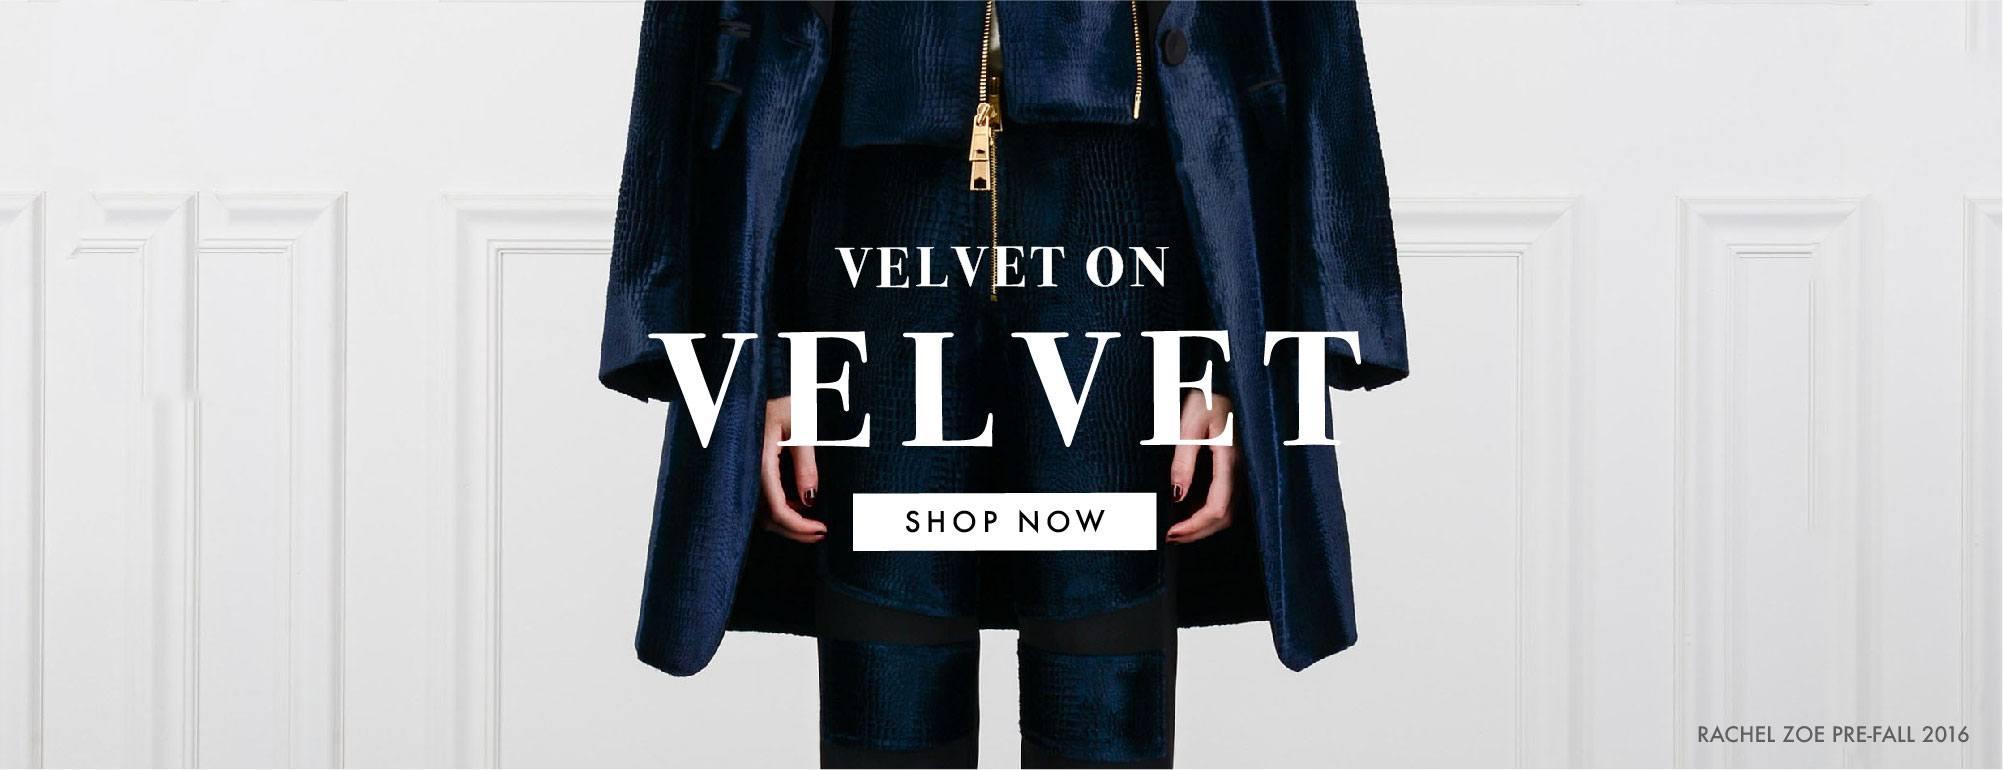 Velvet Fabrics - Shop Now